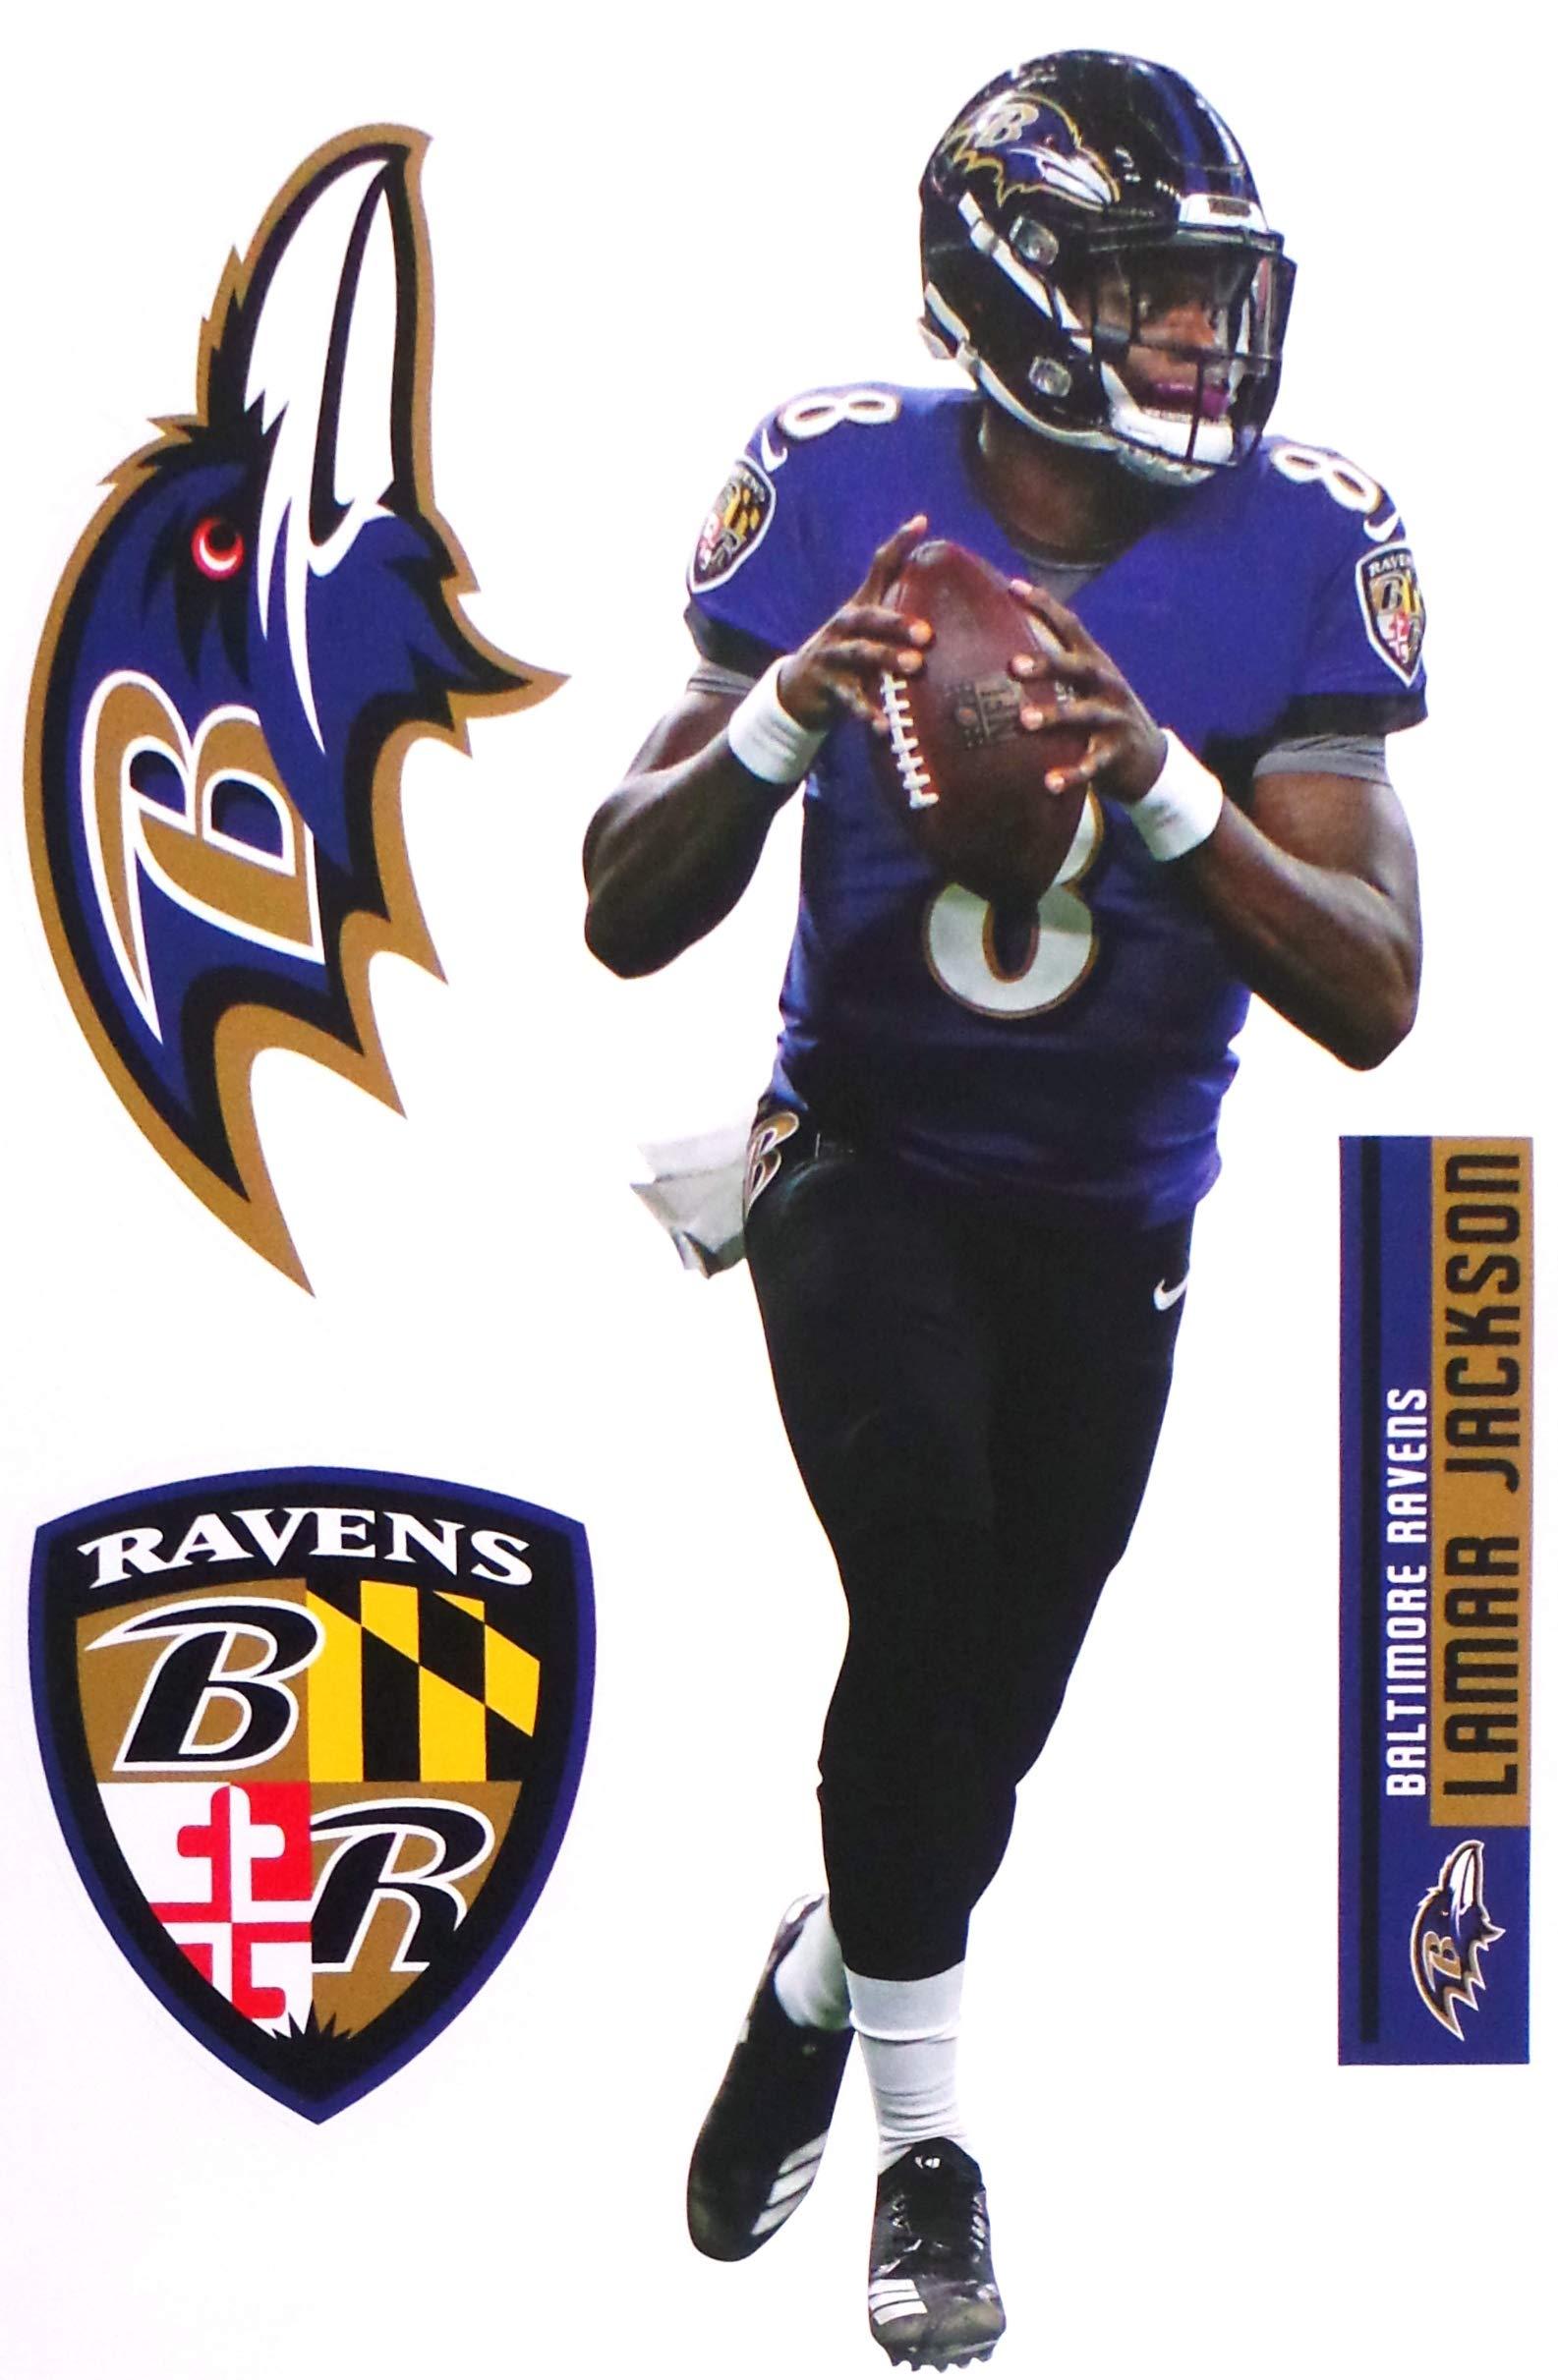 FATHEAD Lamar Jackson Baltimore Ravens Logo Set Official NFL Vinyl Wall Graphics 17'' INCH by FATHEAD